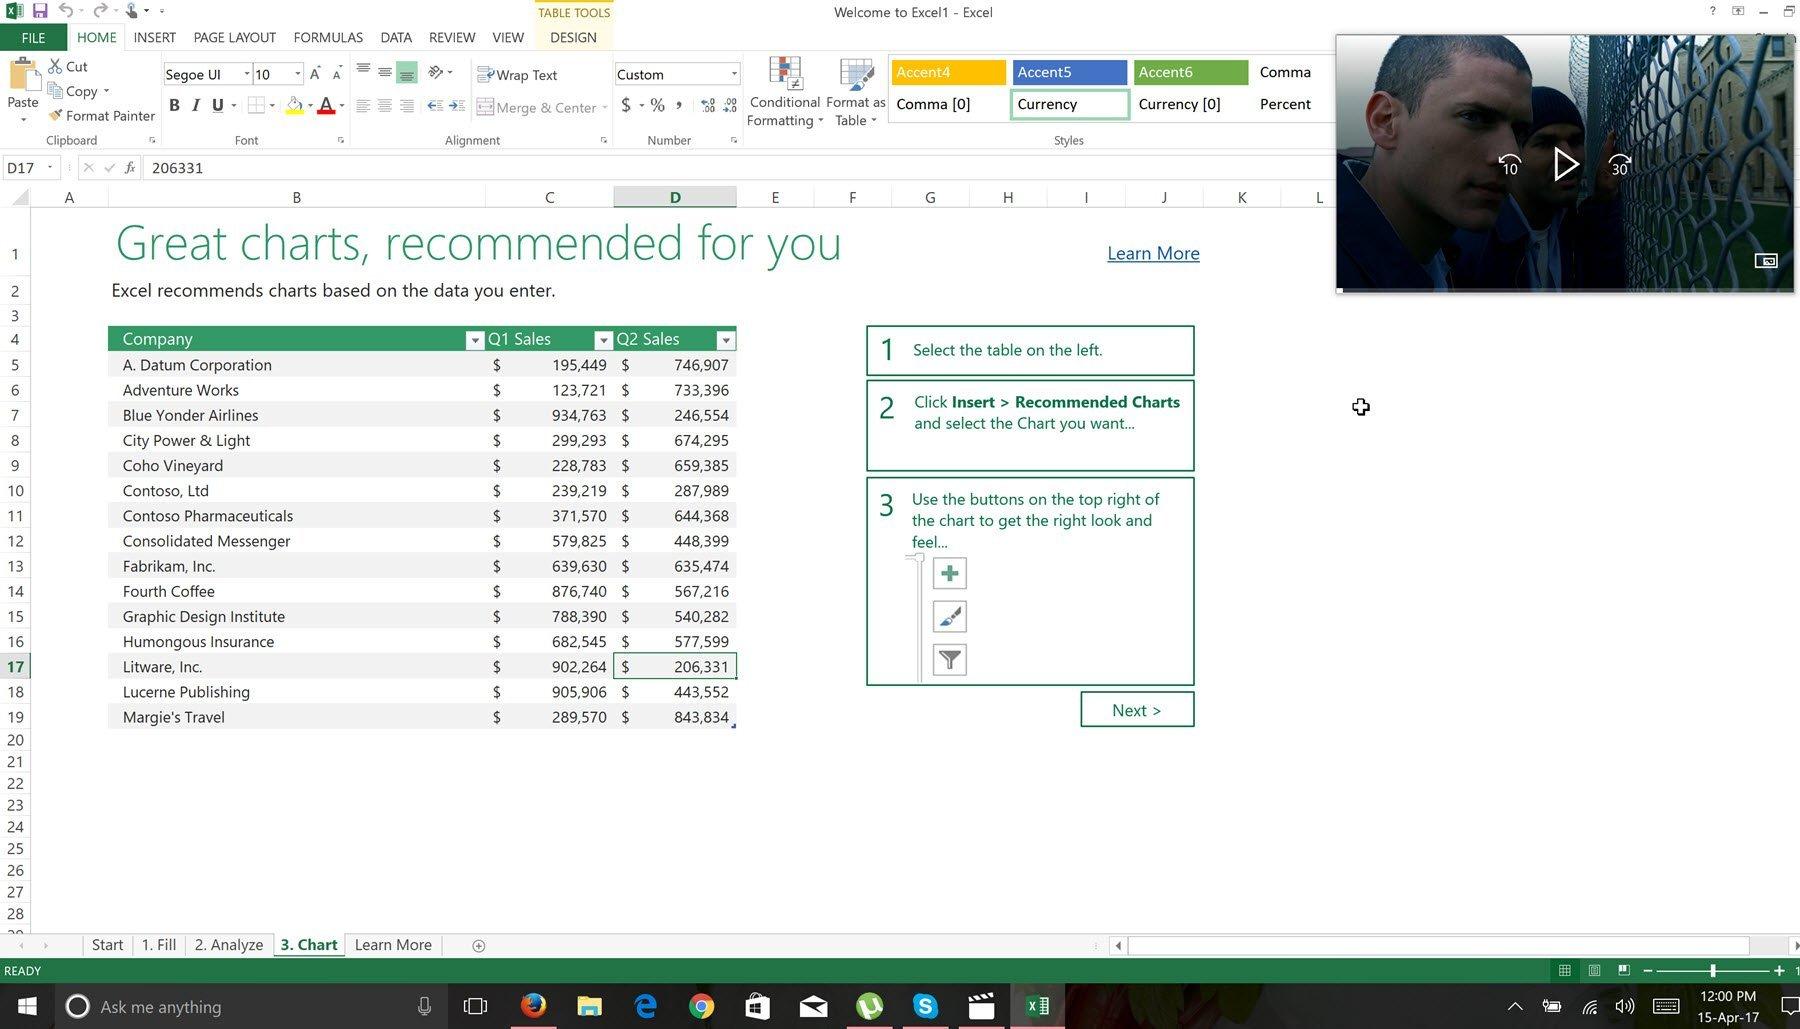 Windows 10 Picture in Picture